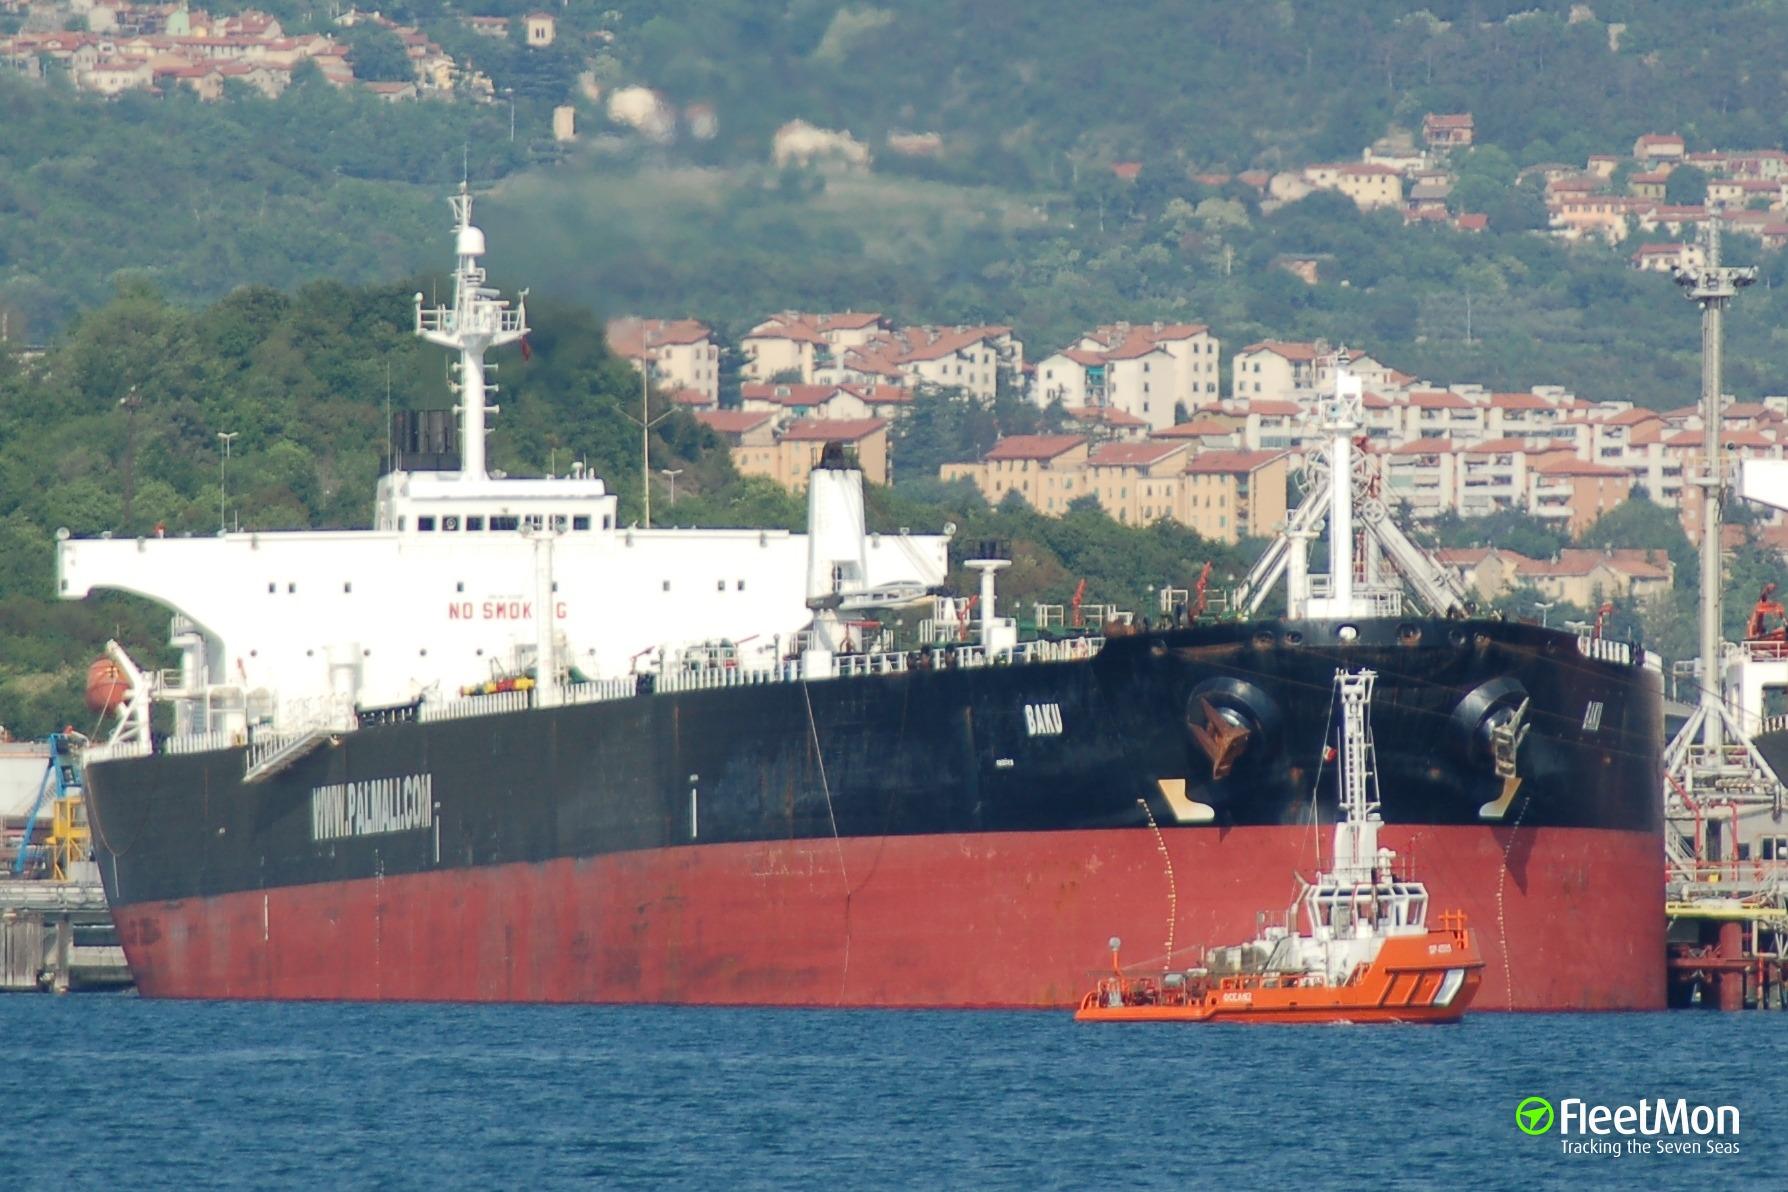 Palmali's aframax Baku fired upon by Libyan Navy